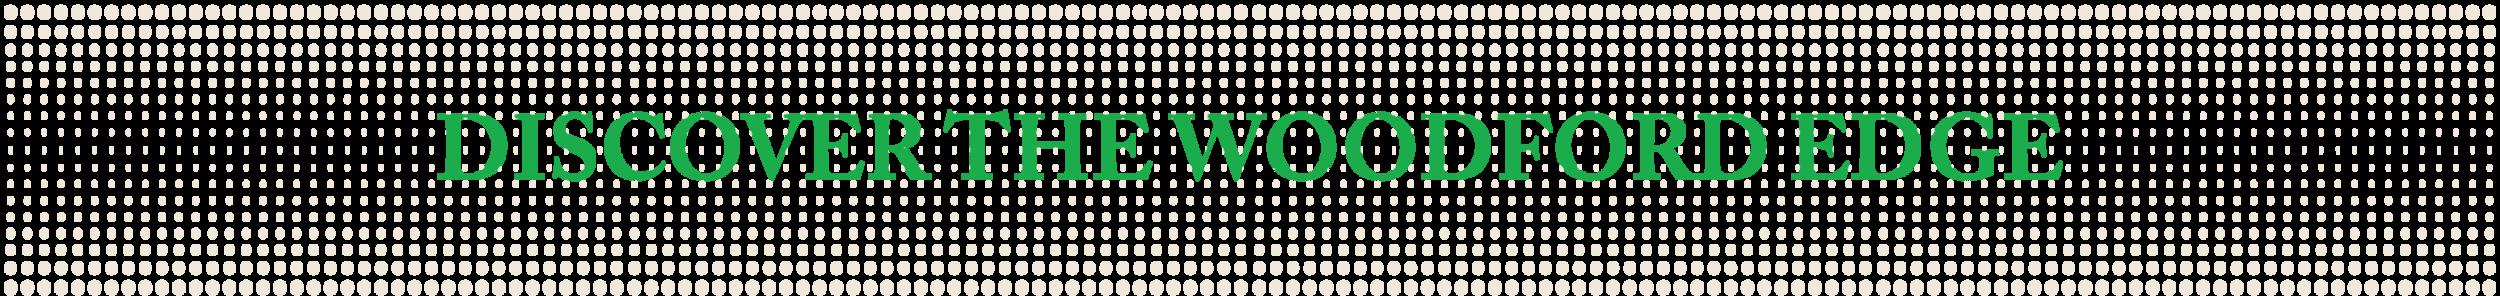 Woodford_WoodfordEdge_v4.png